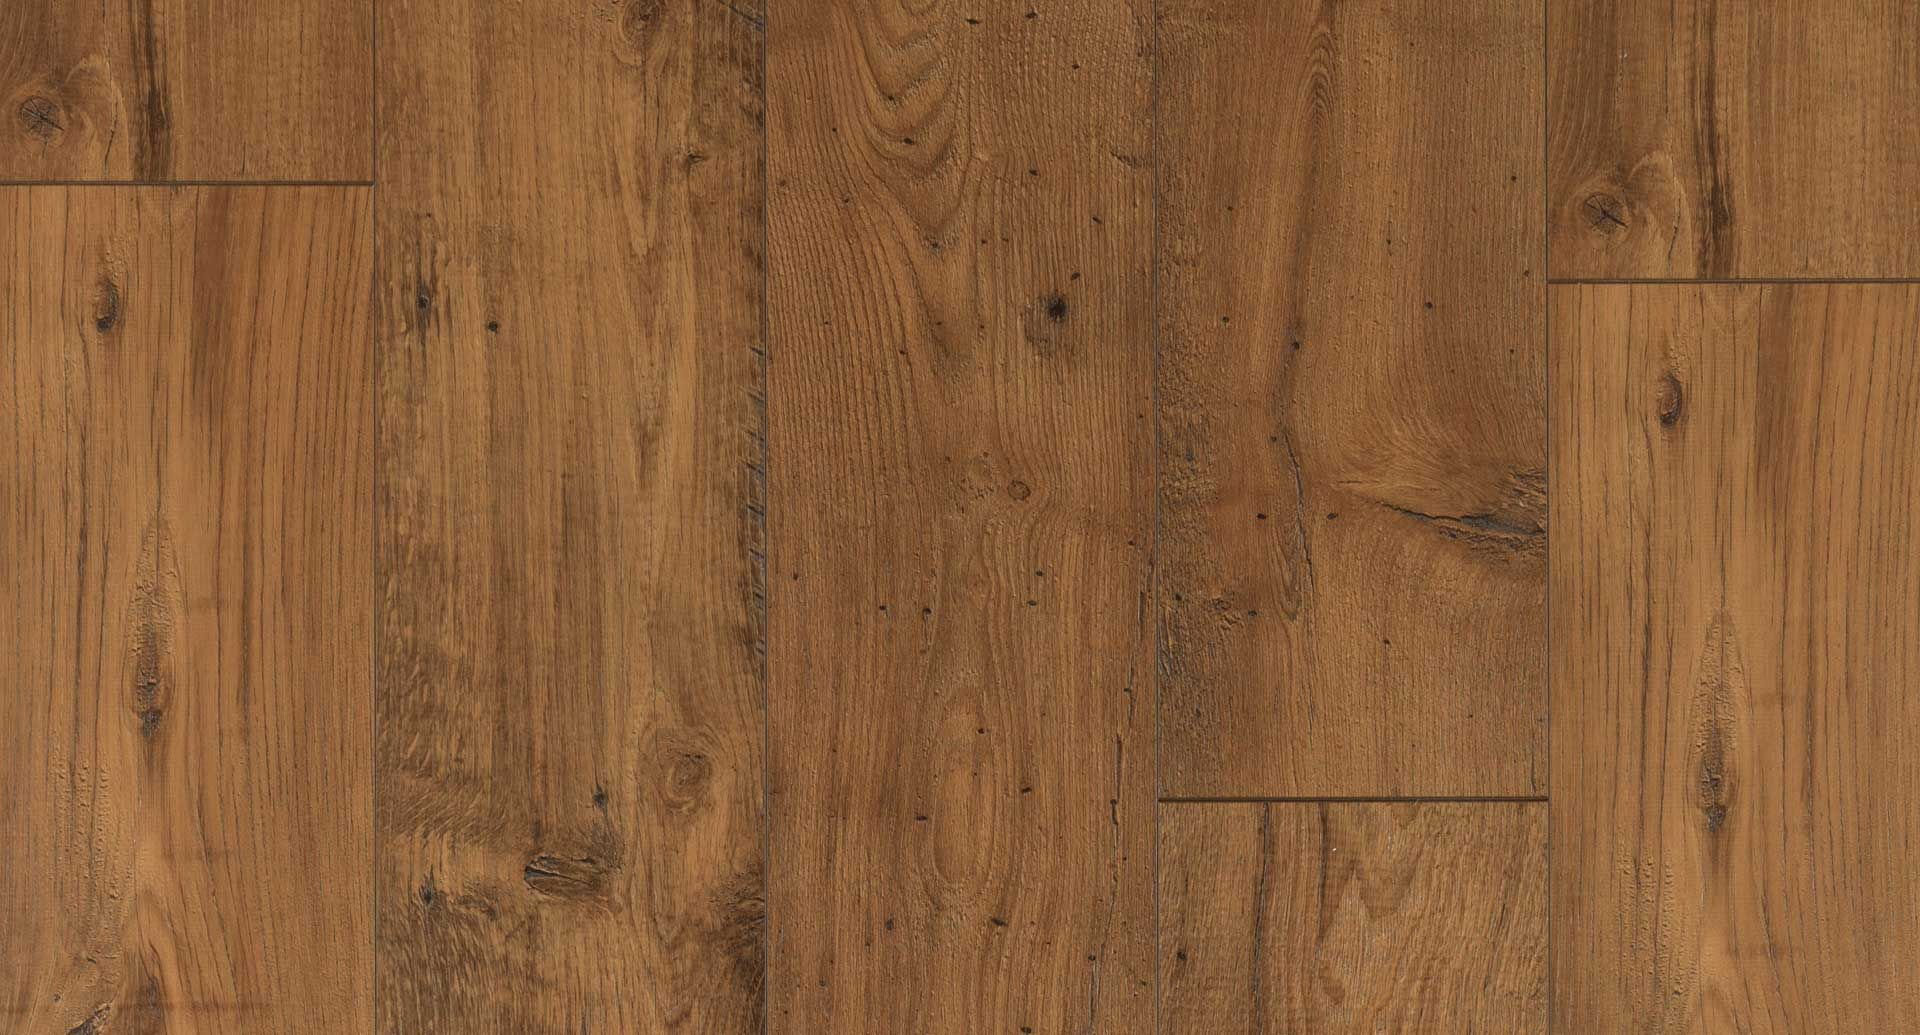 Amber Chestnut Textured Laminate Floor Medium Chestnut Wood Finish 12mm 1 Strip Plank Laminate Flooring Easy Laminate Flooring Wood Laminate Pergo Flooring